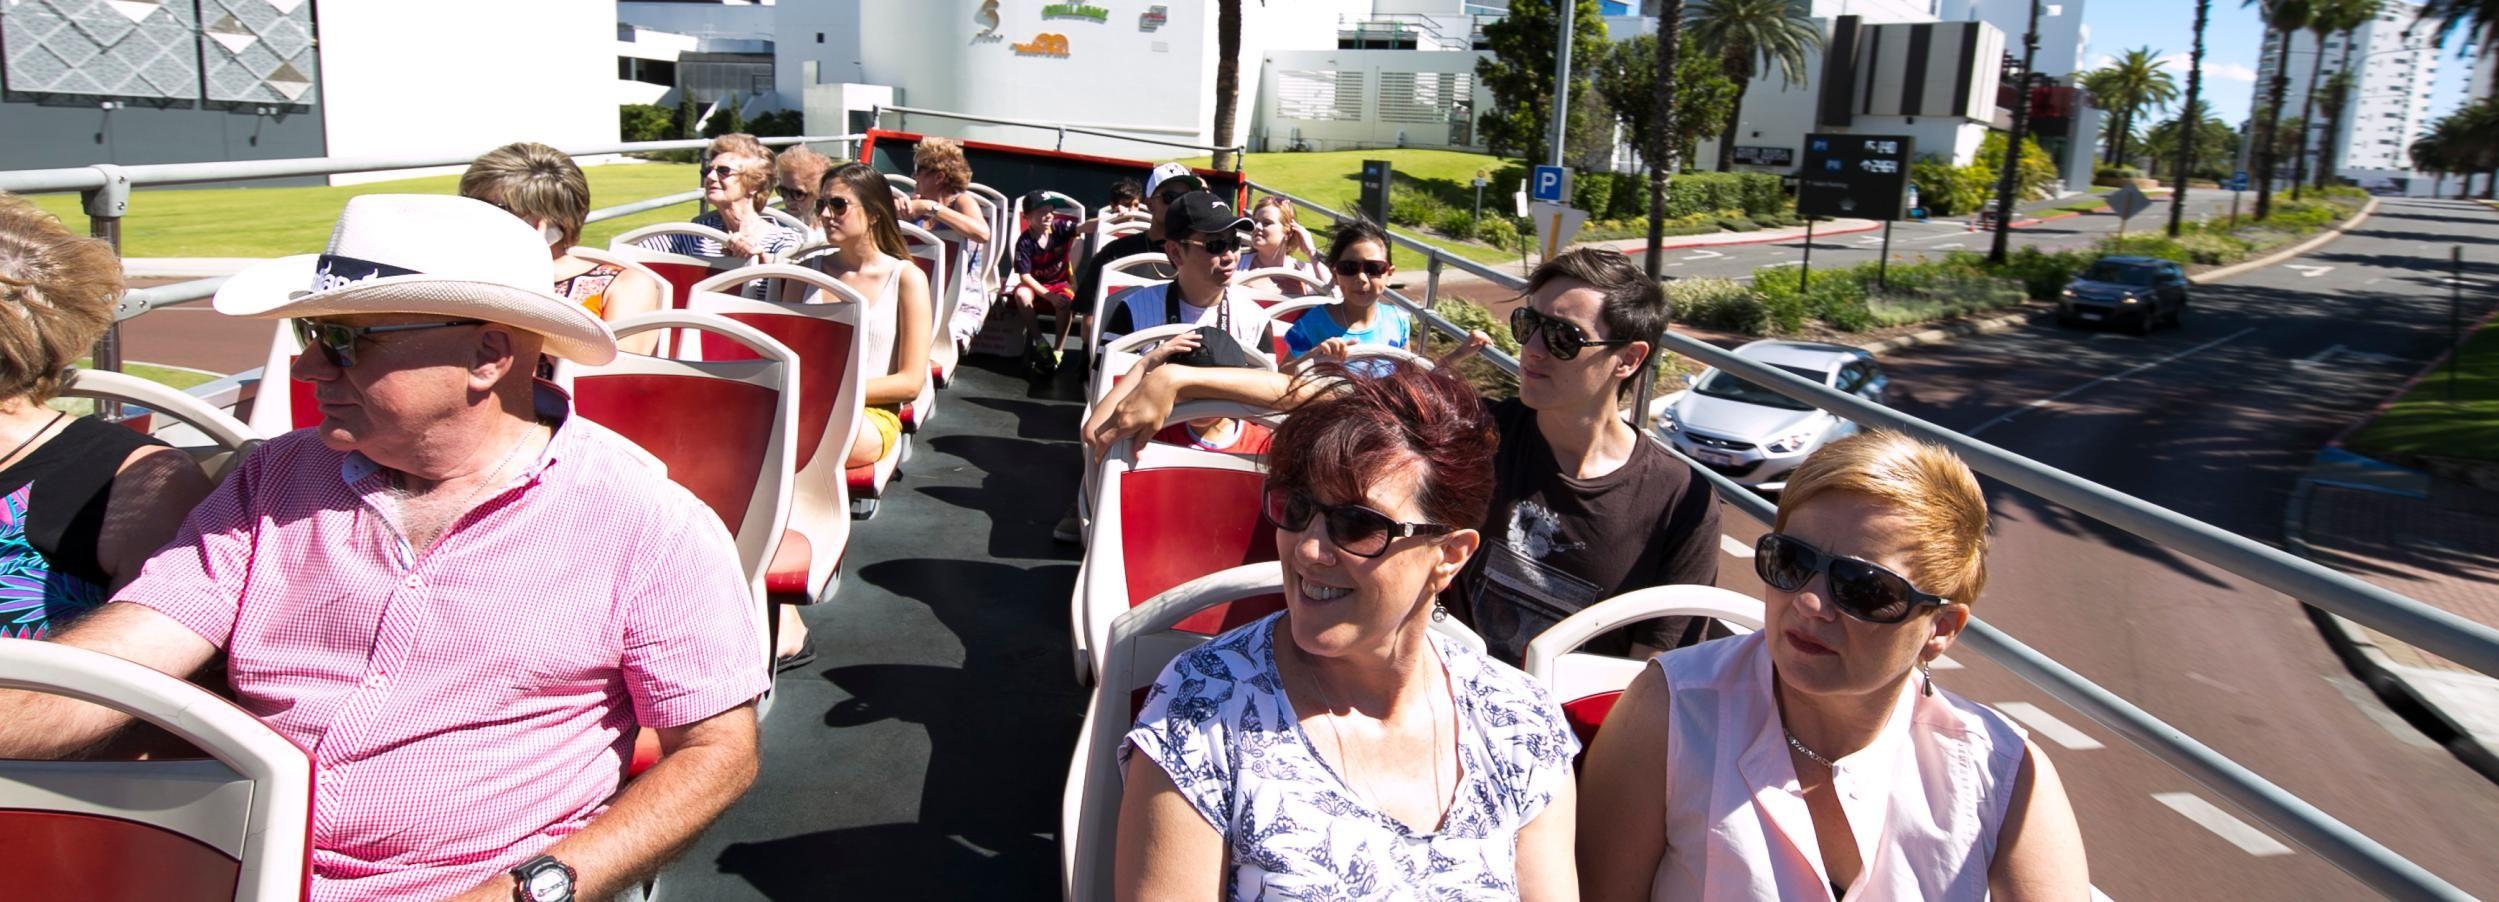 Perth Hop-on Hop-Off Bus Tour & Perth Mint Entry Ticket